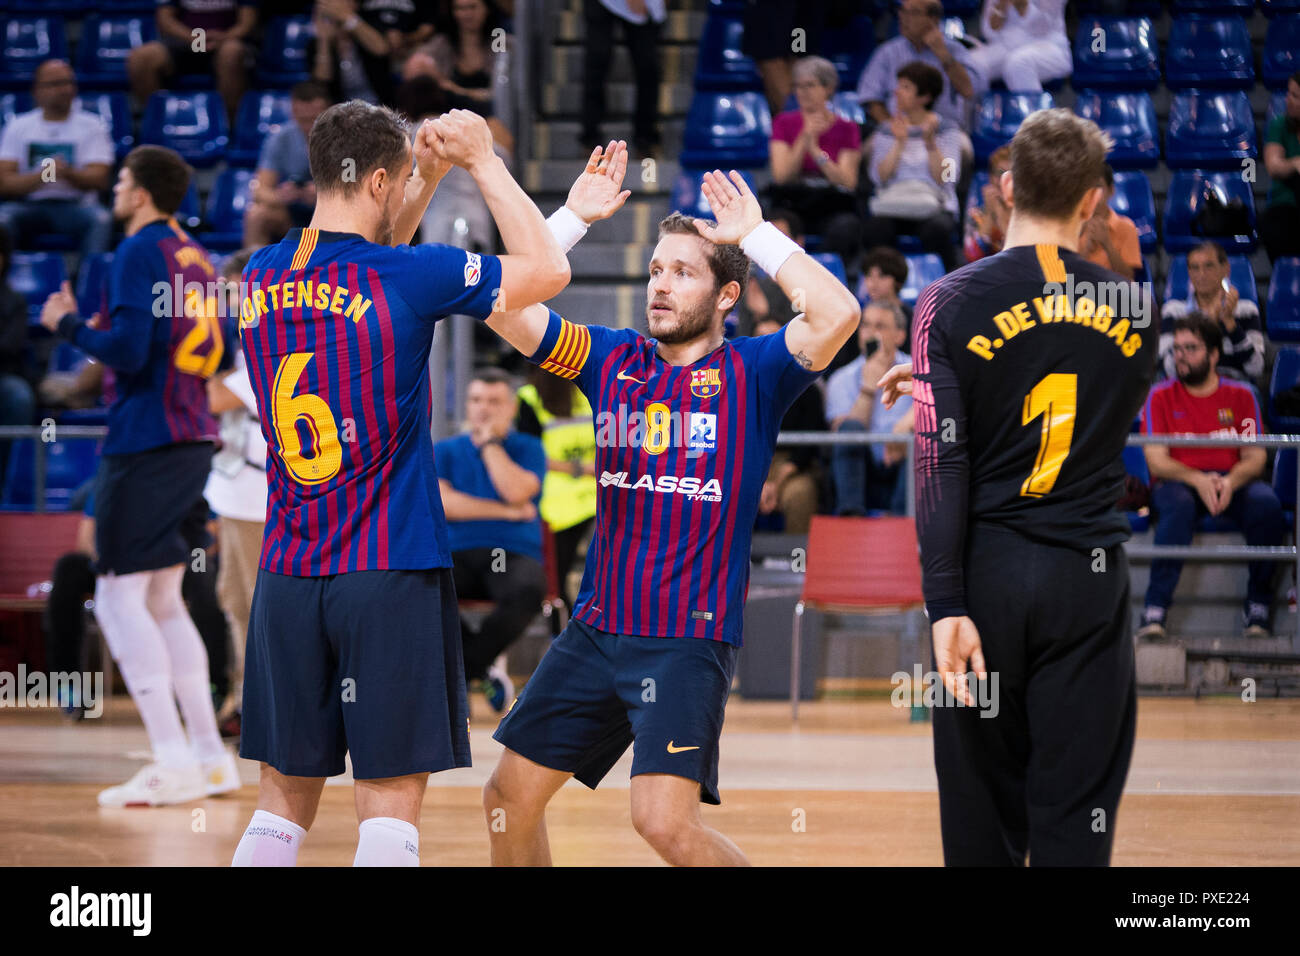 e8529985b4f Fc Barcelona Lassa Handball Trikot – Verein Bild Idee